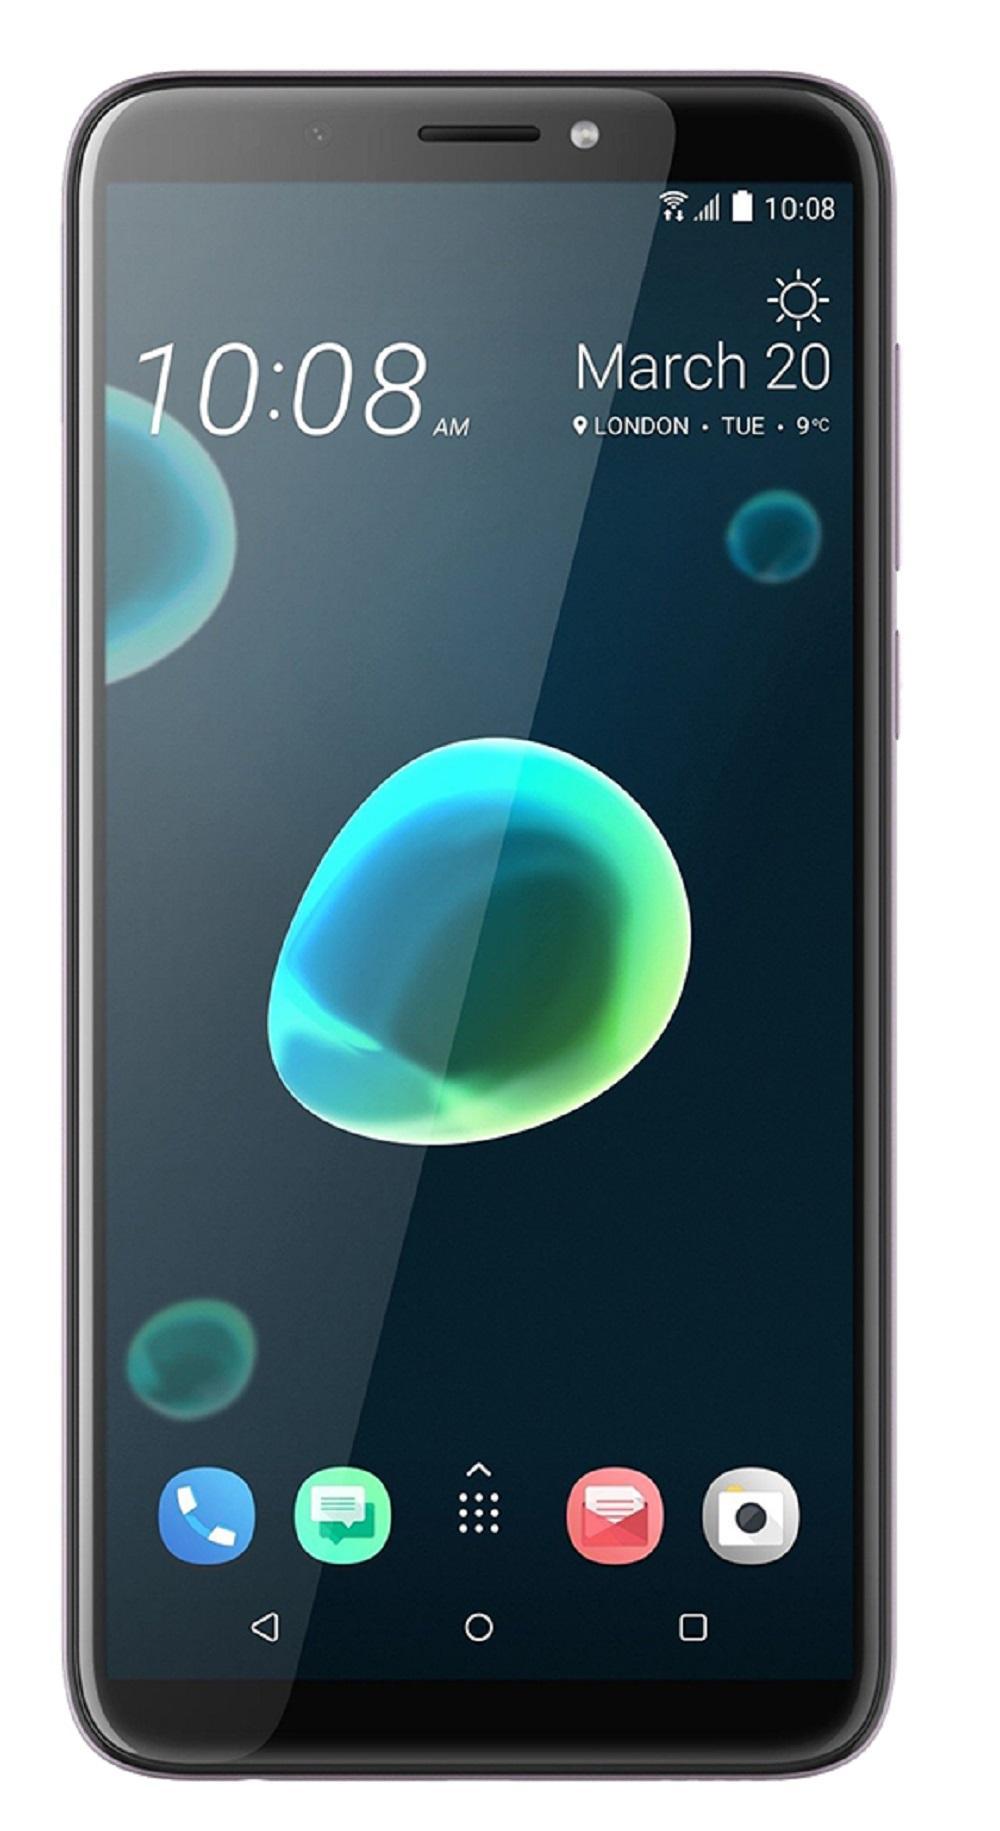 HTC Desire 12+ Plus 3GB Ram 32GB Rom Dual Sim - Warm Silver (Purple)